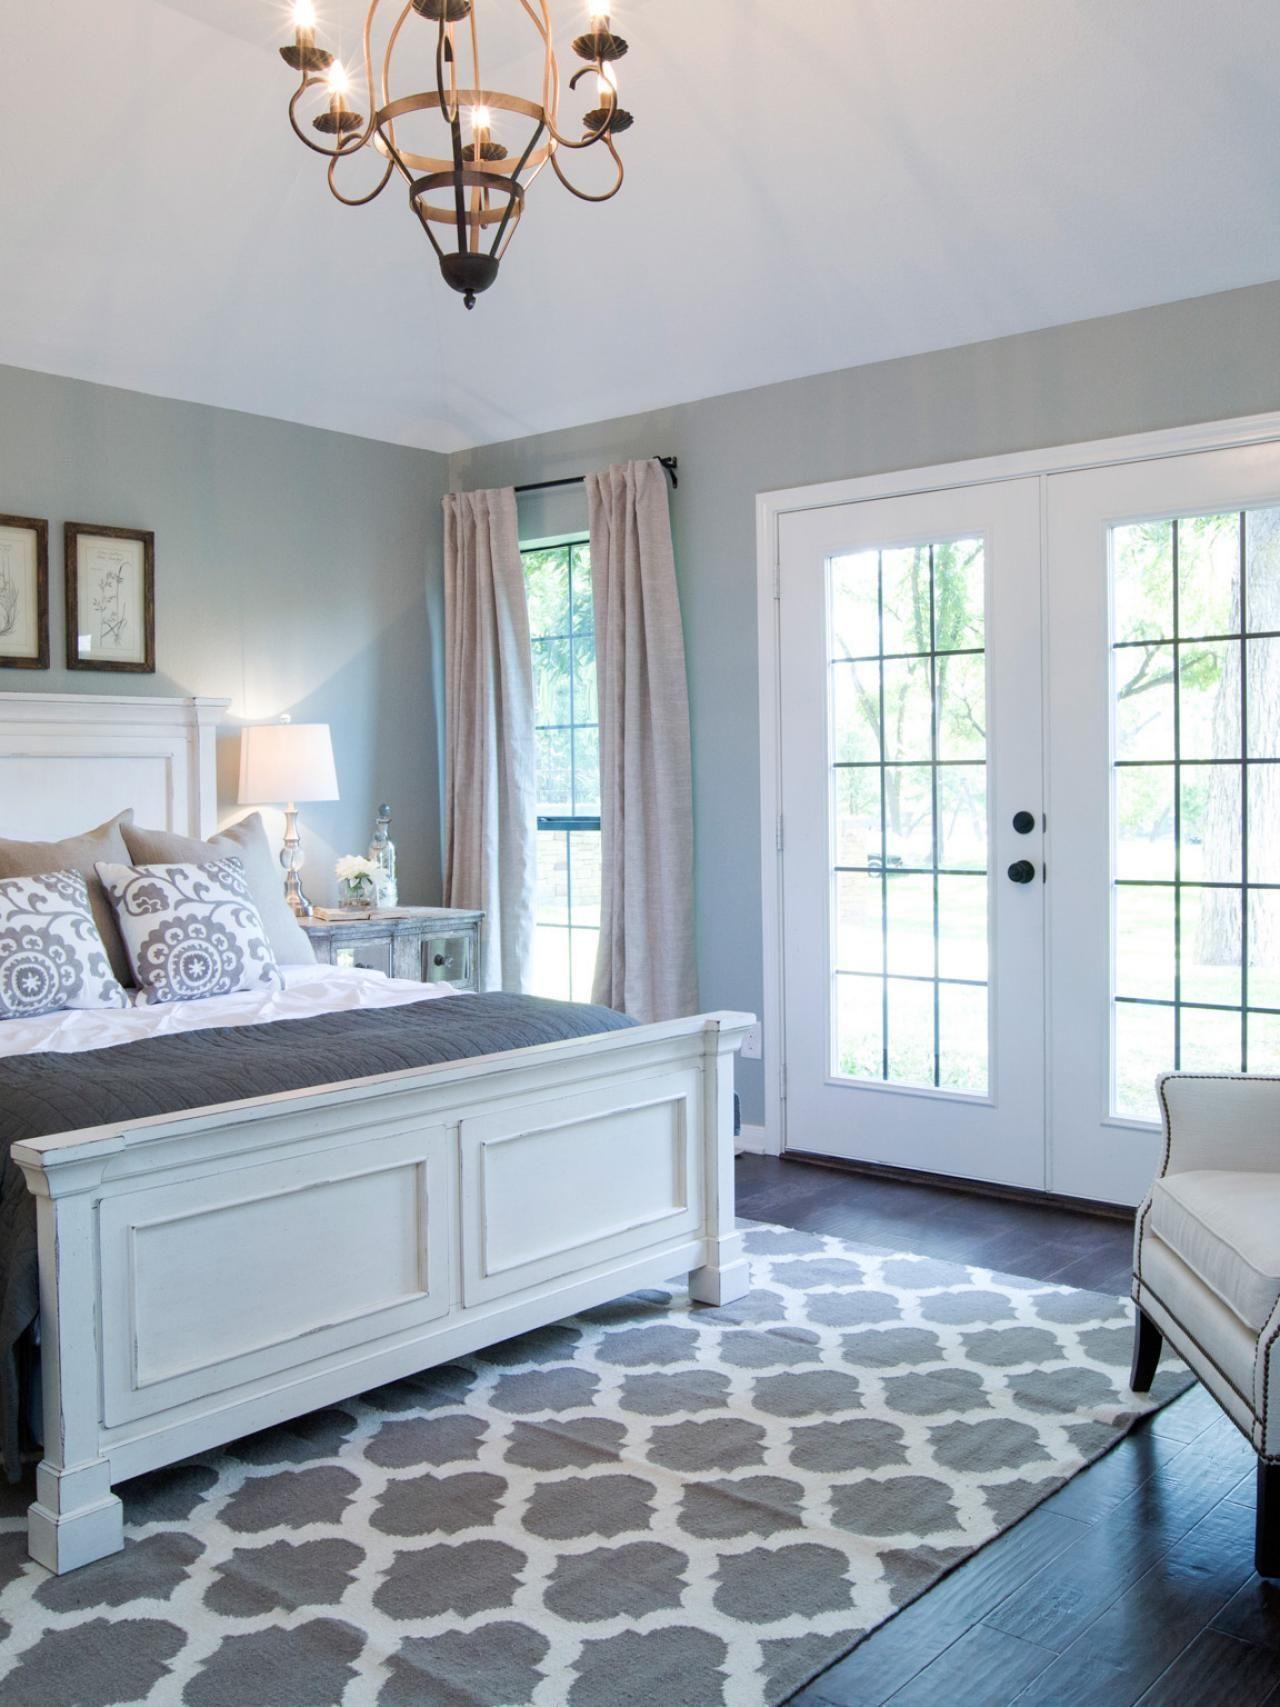 8 Gorgeous Small Master Bedroom Ideas (Decor & Design